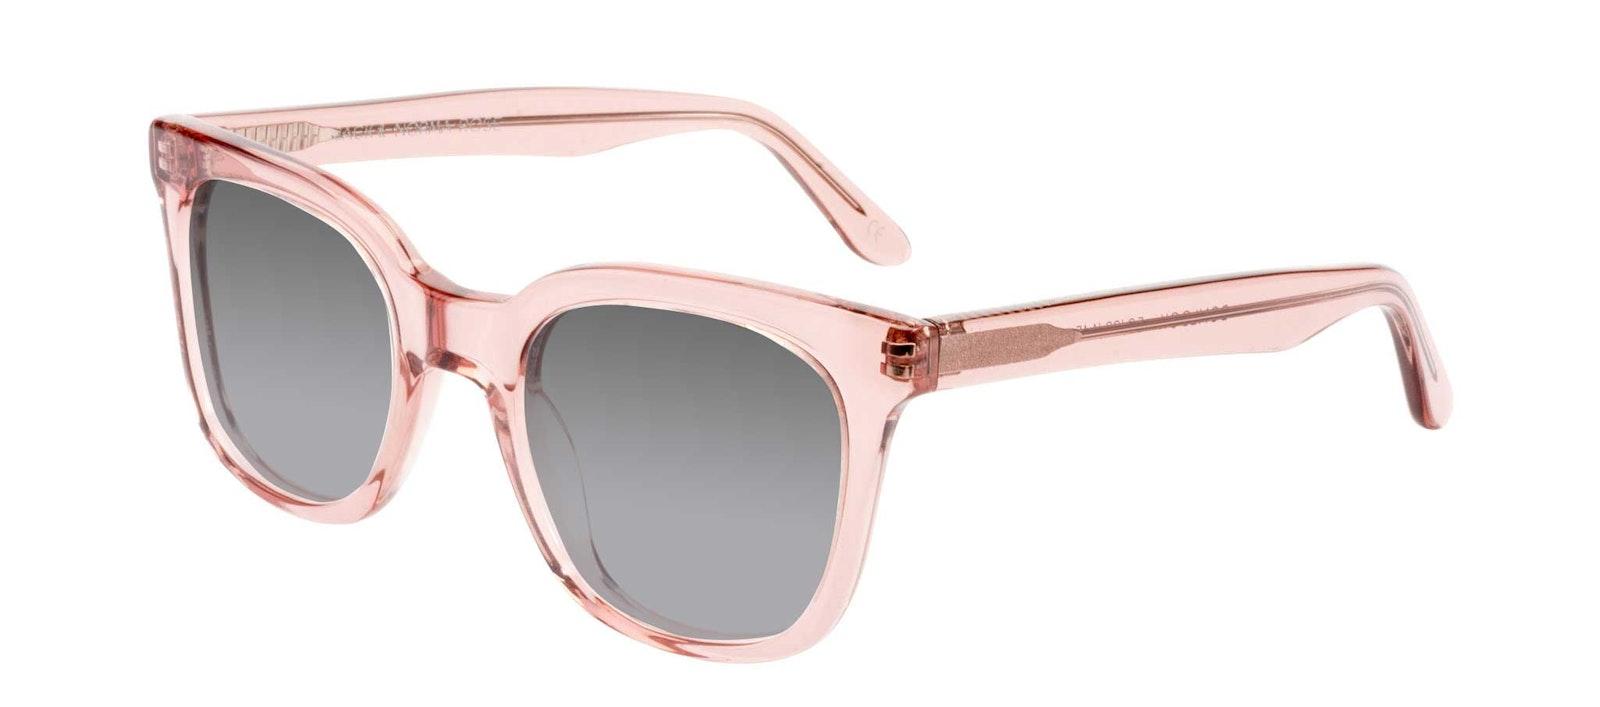 Affordable Fashion Glasses Rectangle Square Sunglasses Women Jack & Norma Rose Tilt